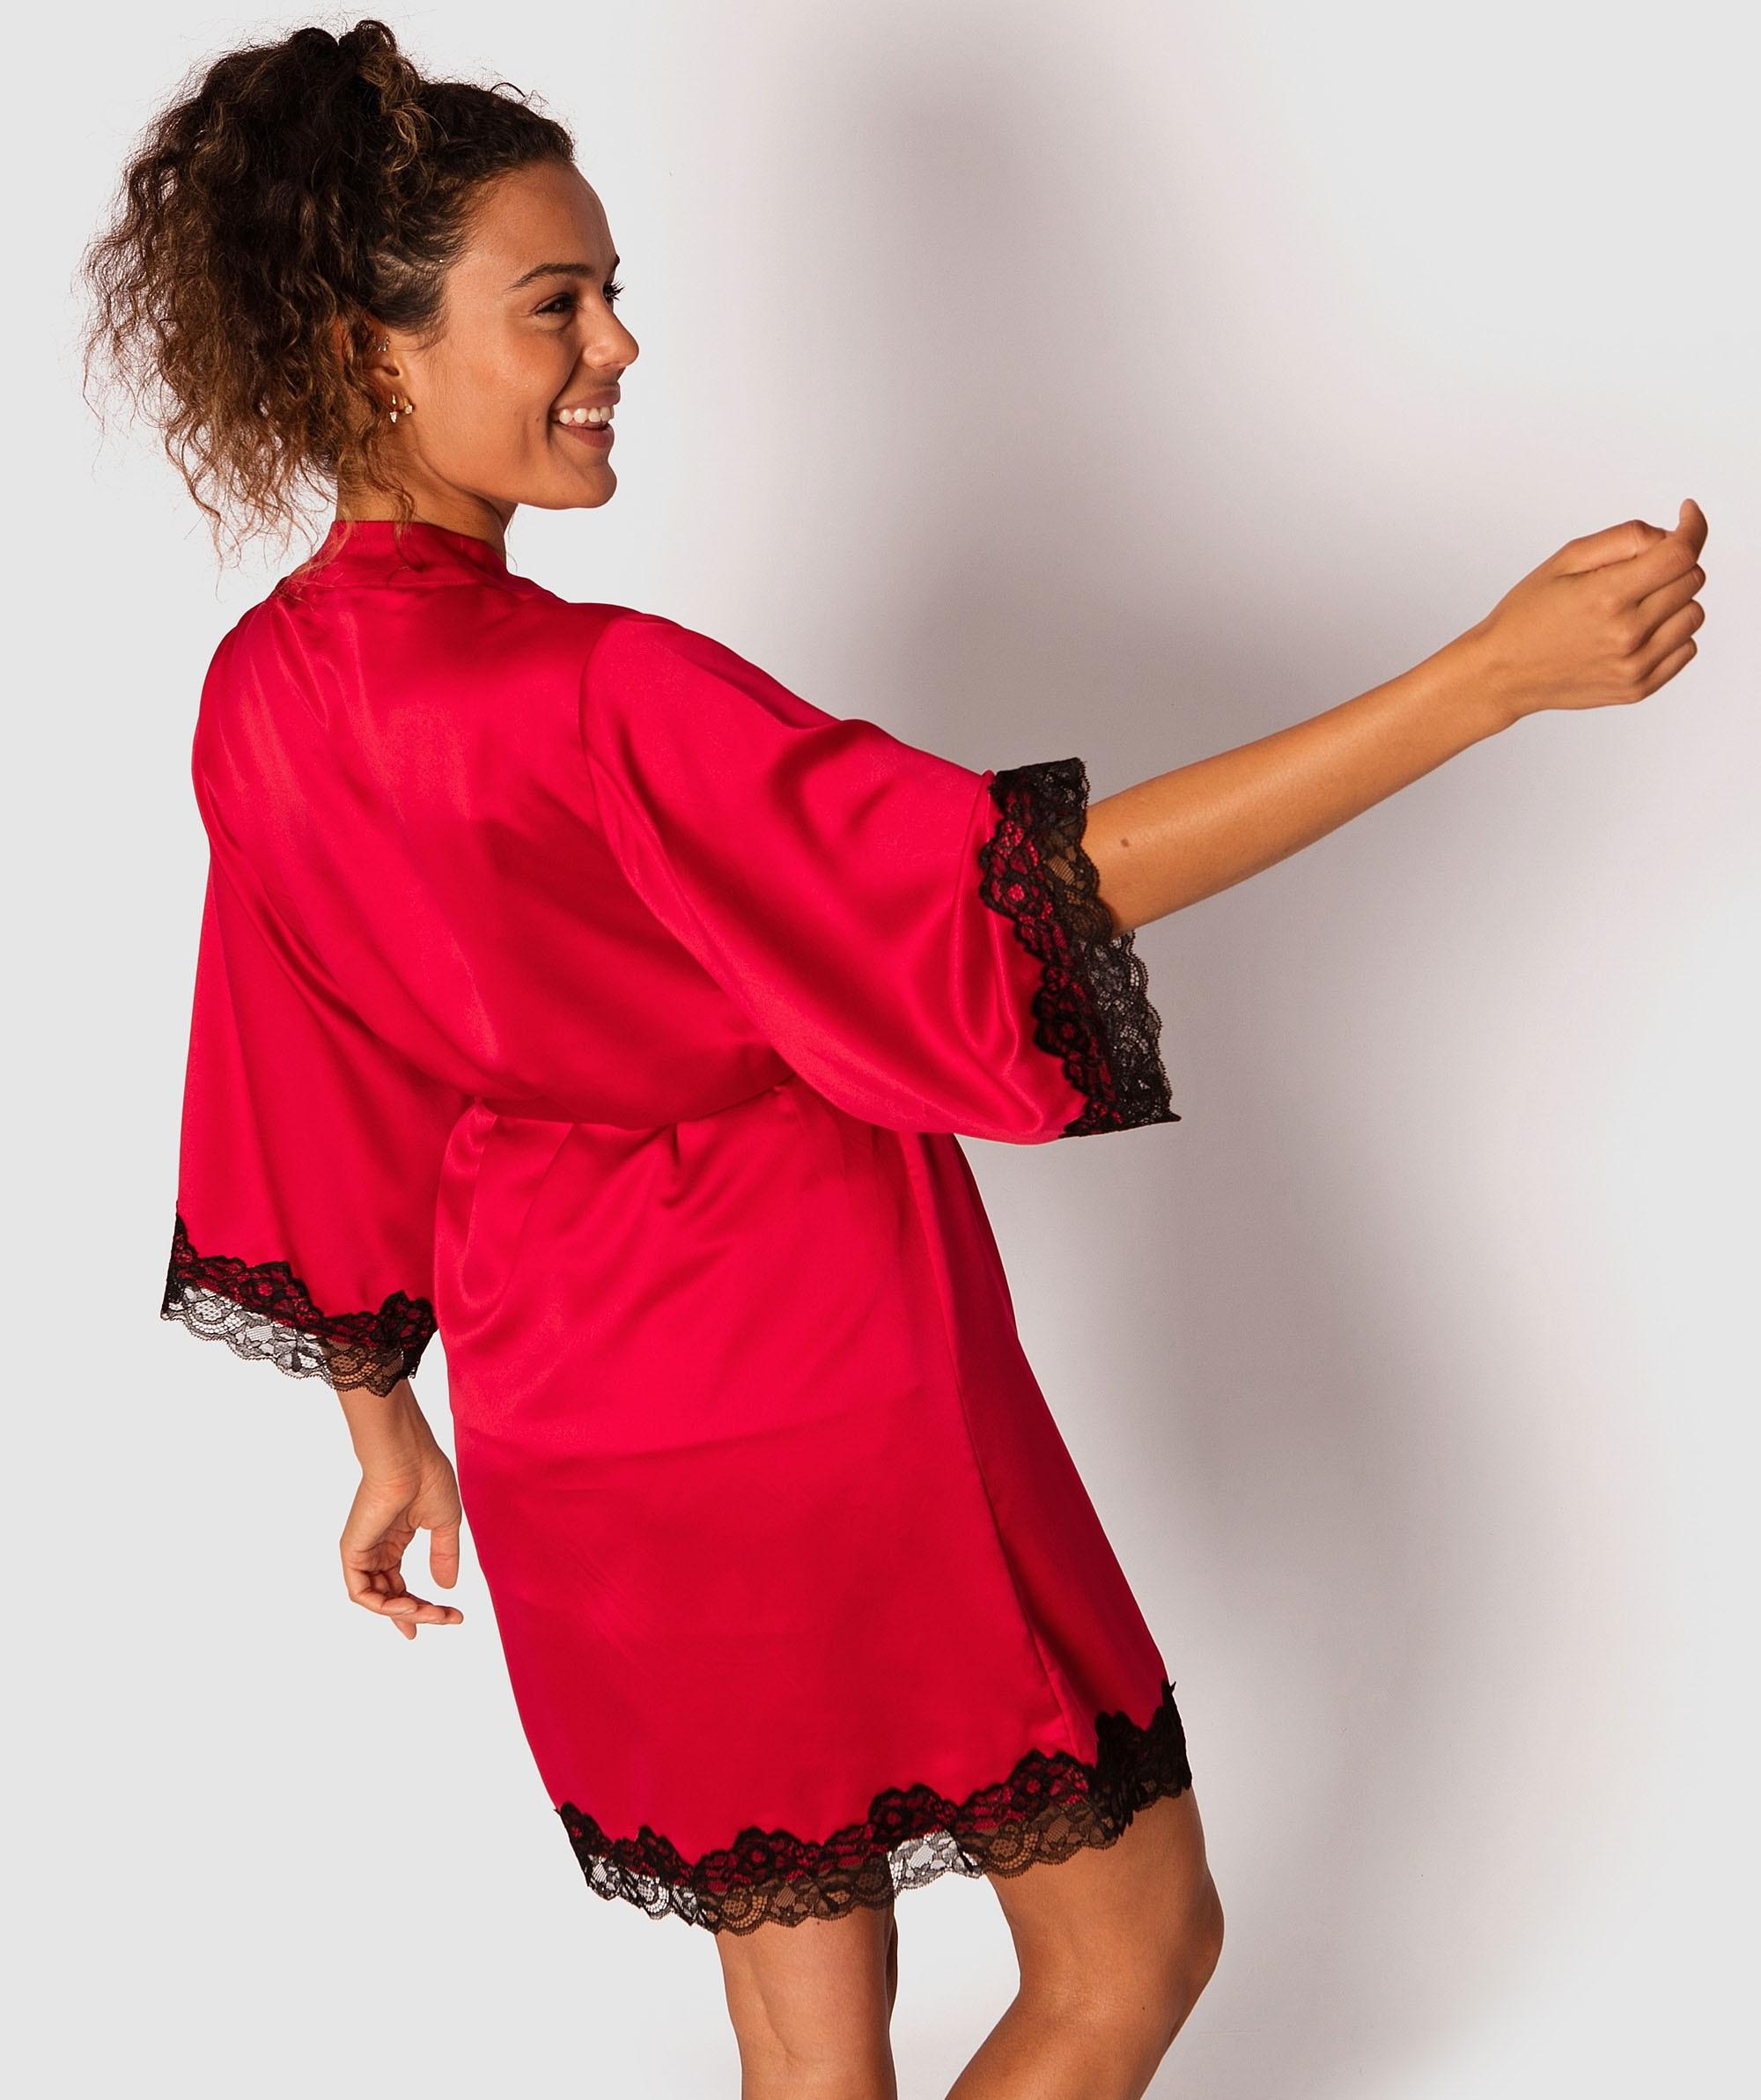 Anastasia Short Wrap - Red